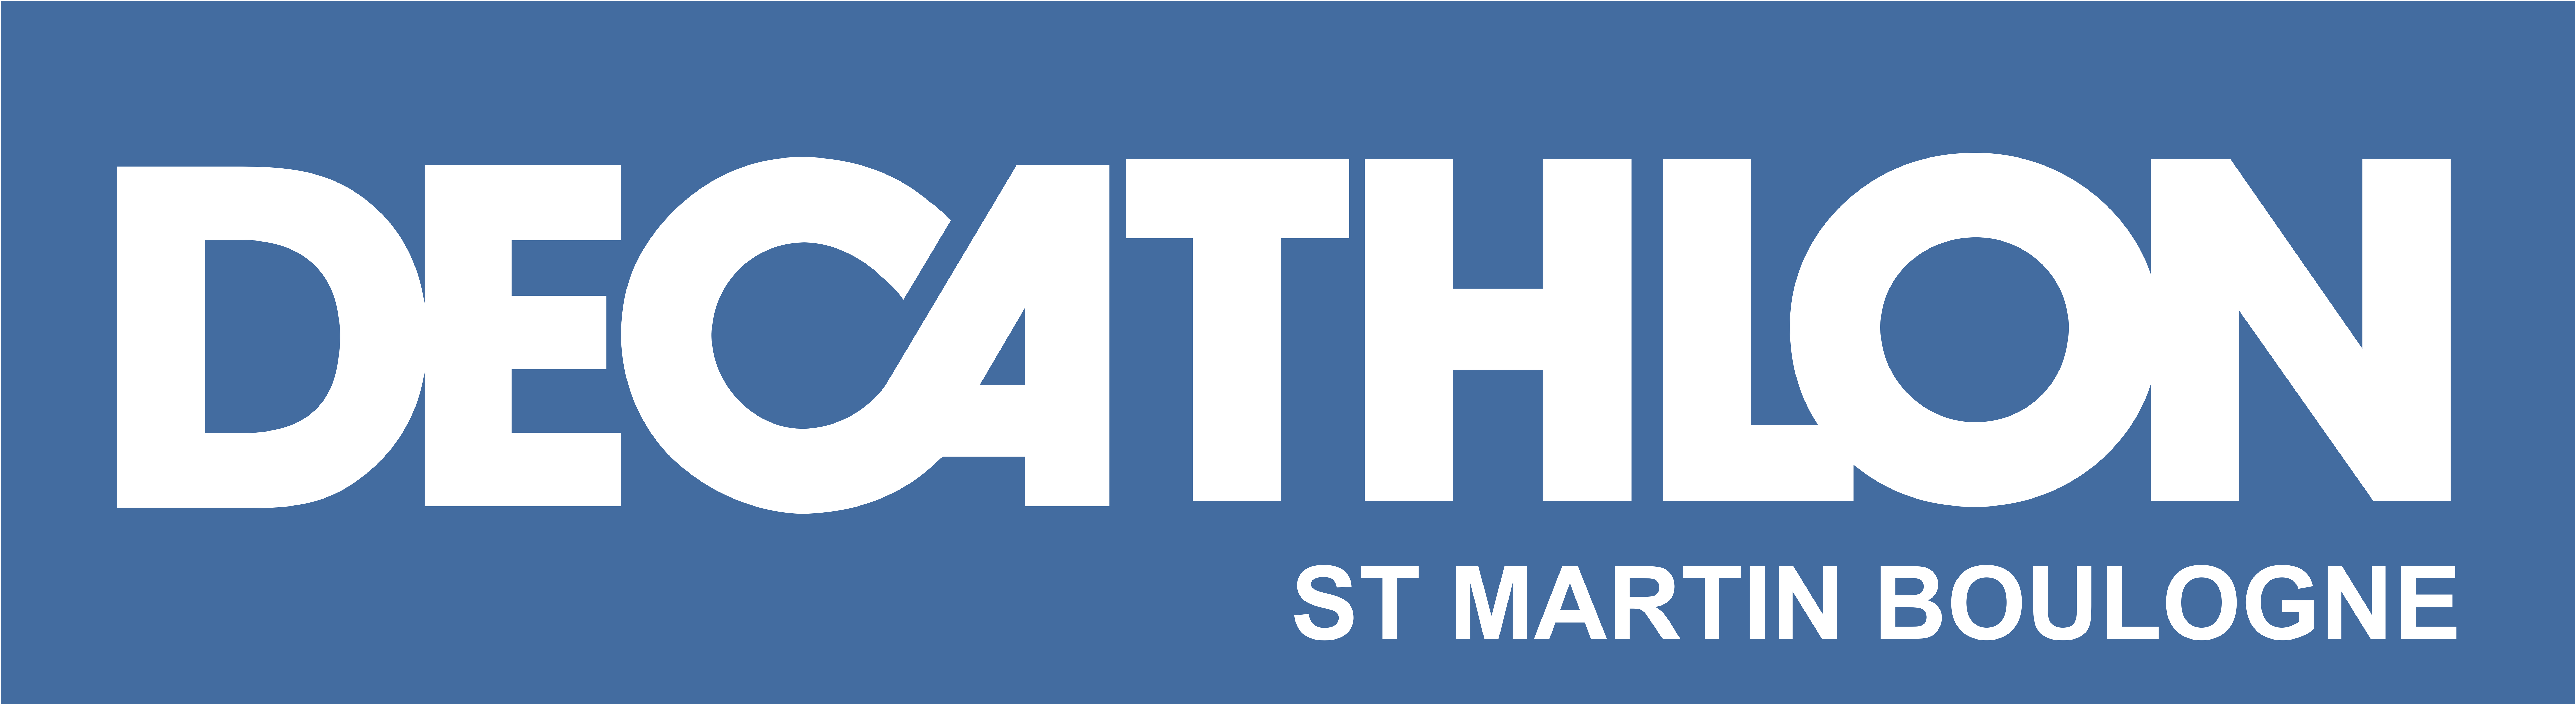 Logo DECATHLON St Martin Boulogne HD